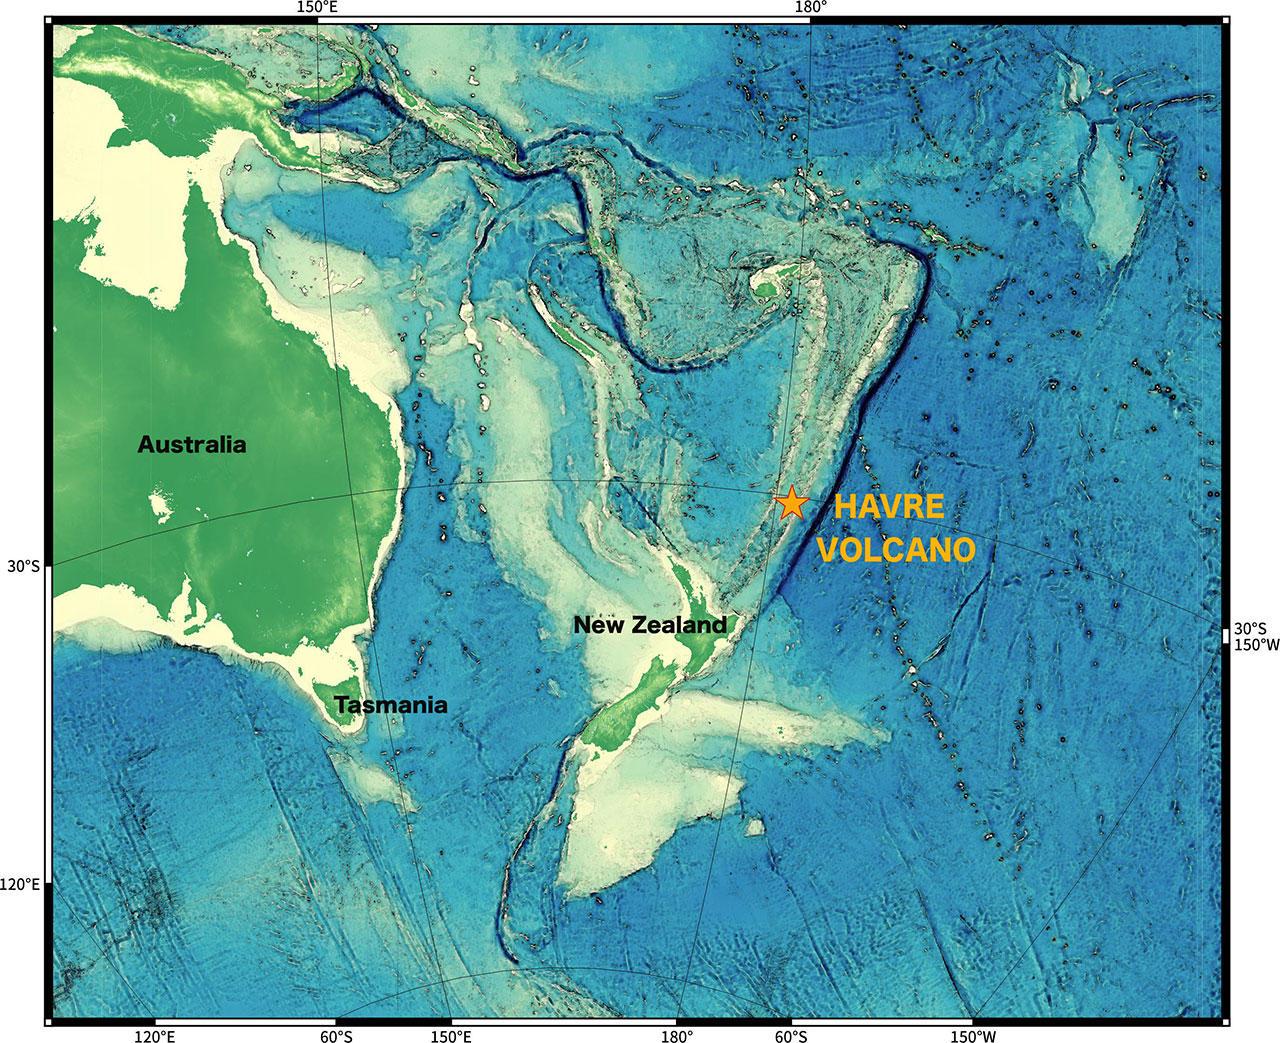 Woods Hole Scientists Make Big DeepOcean Discovery Rhode Island - Oceanographic map